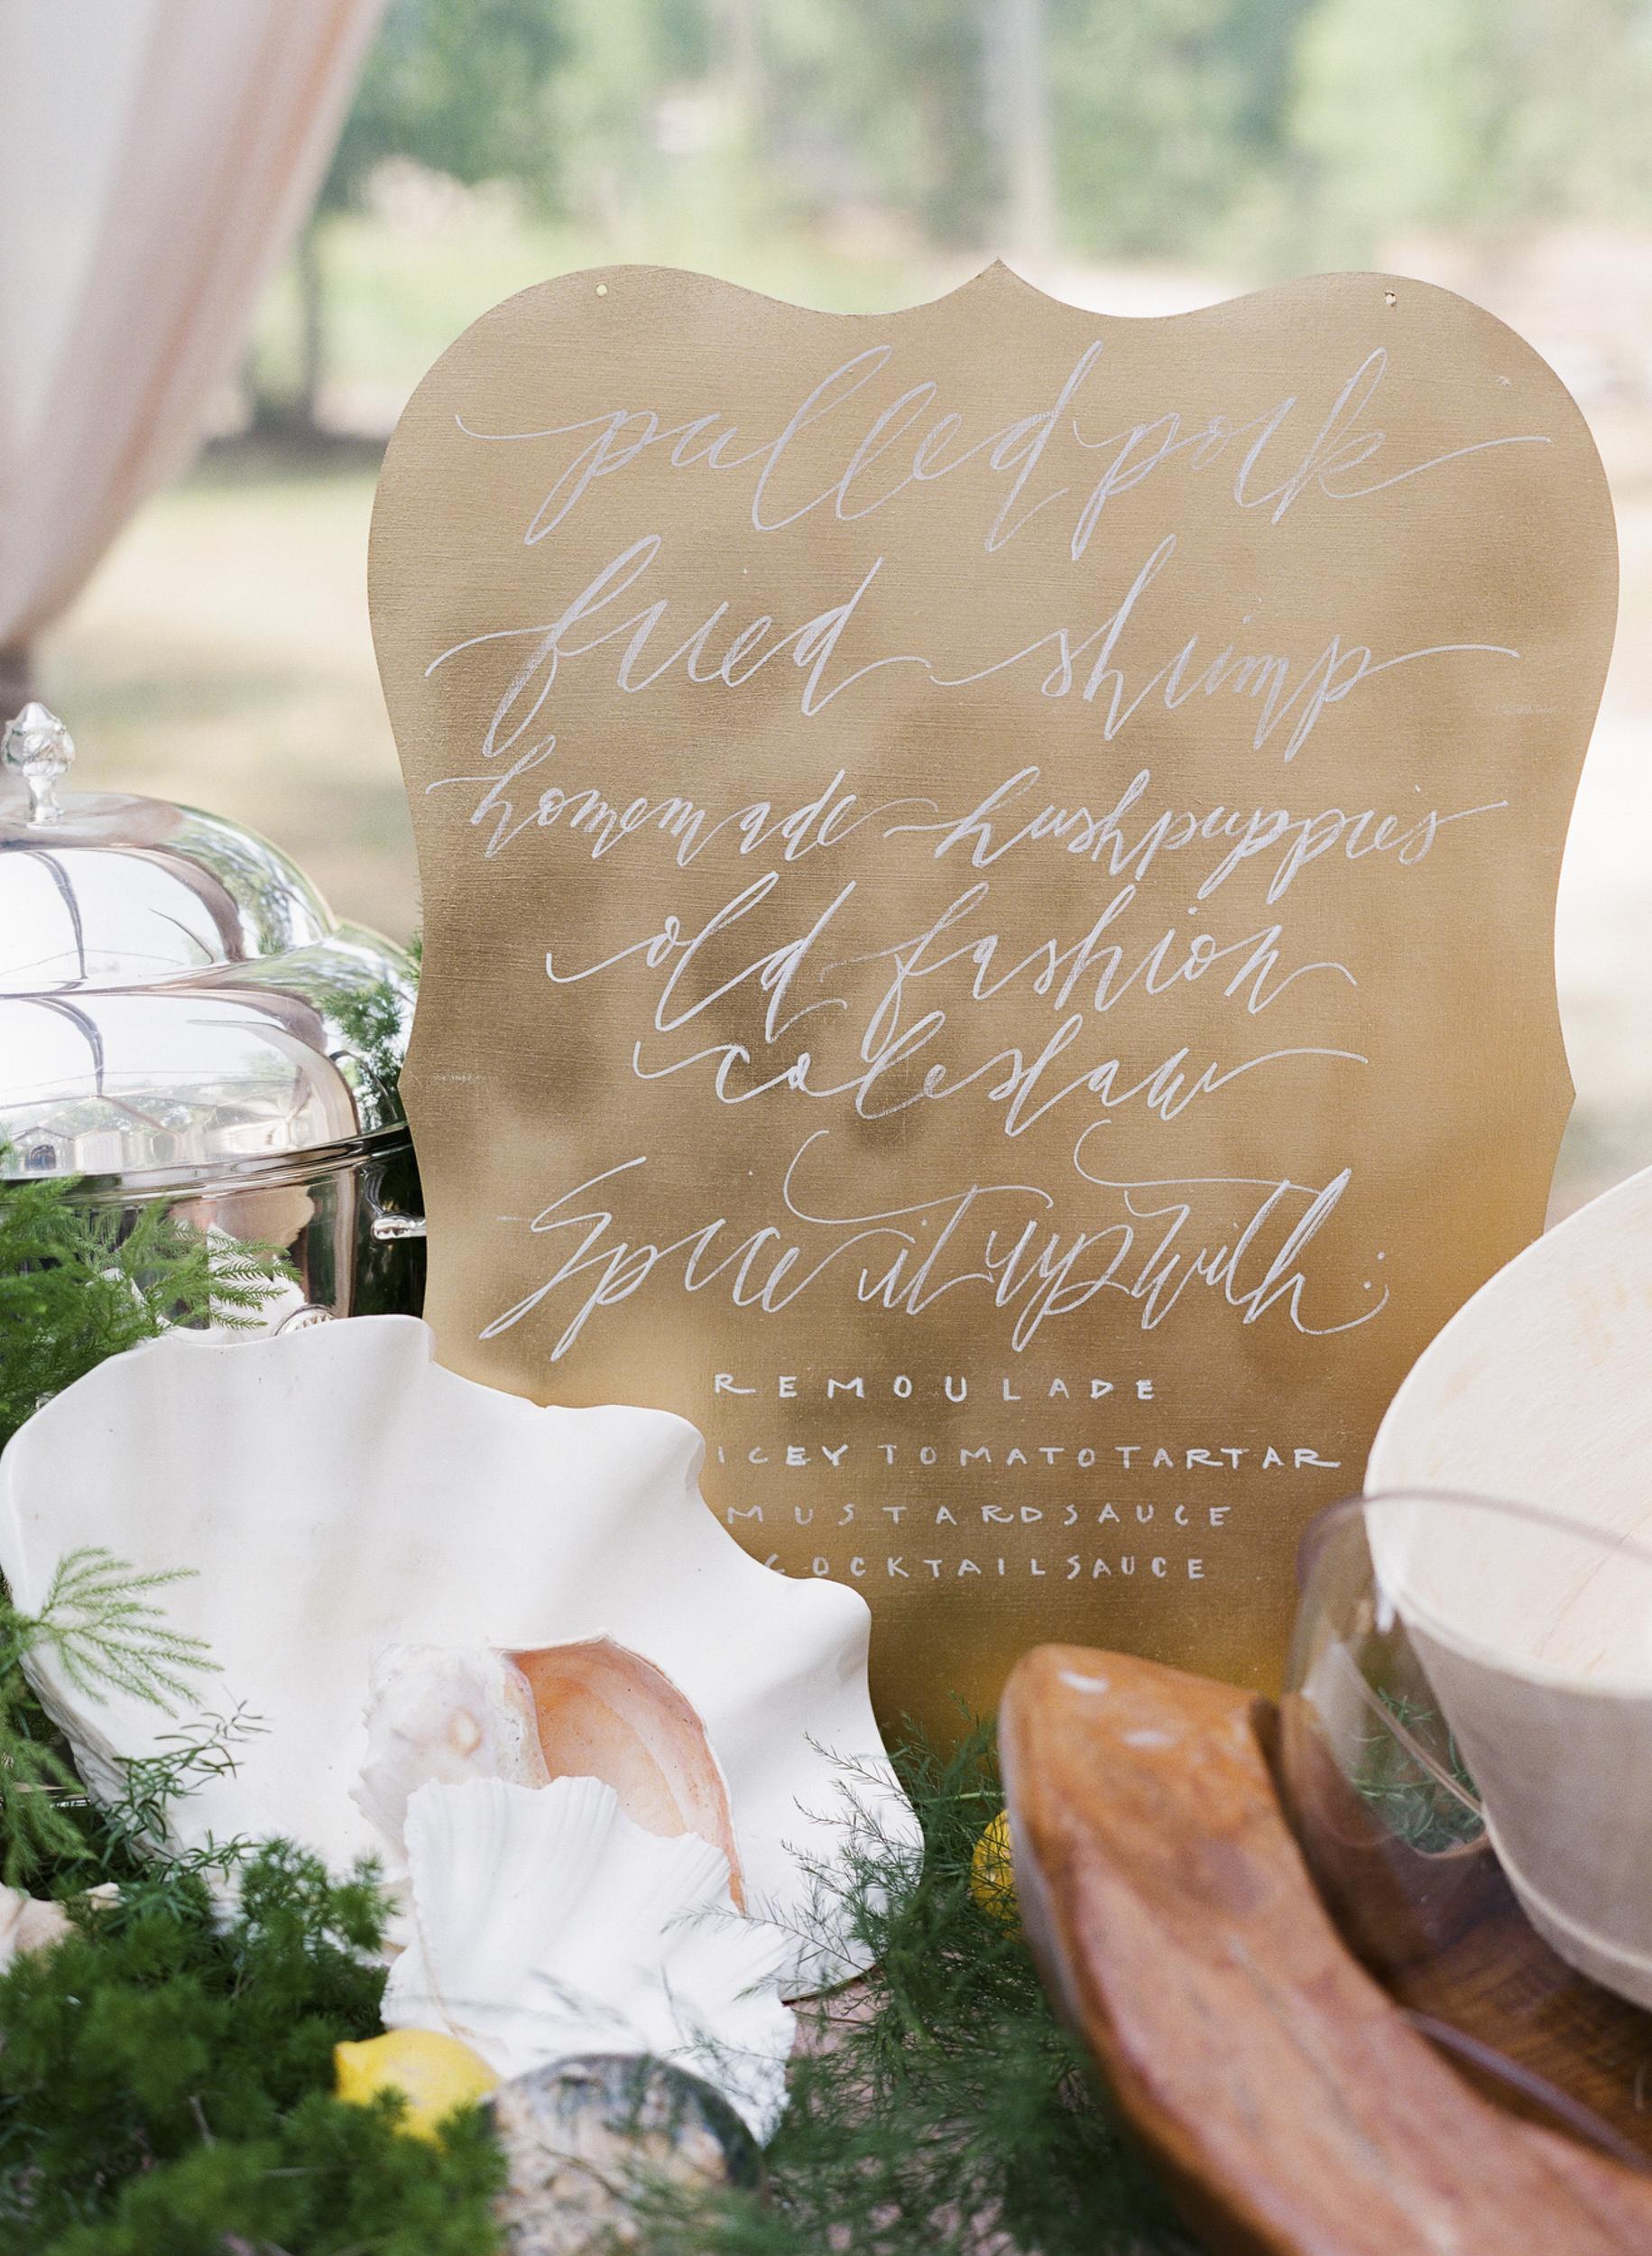 south_carolina_farm_wedding_rustic_chic_surprise_secret_luxe_wedding_bachelorette_emily_maynard_real_weddings-6.jpg